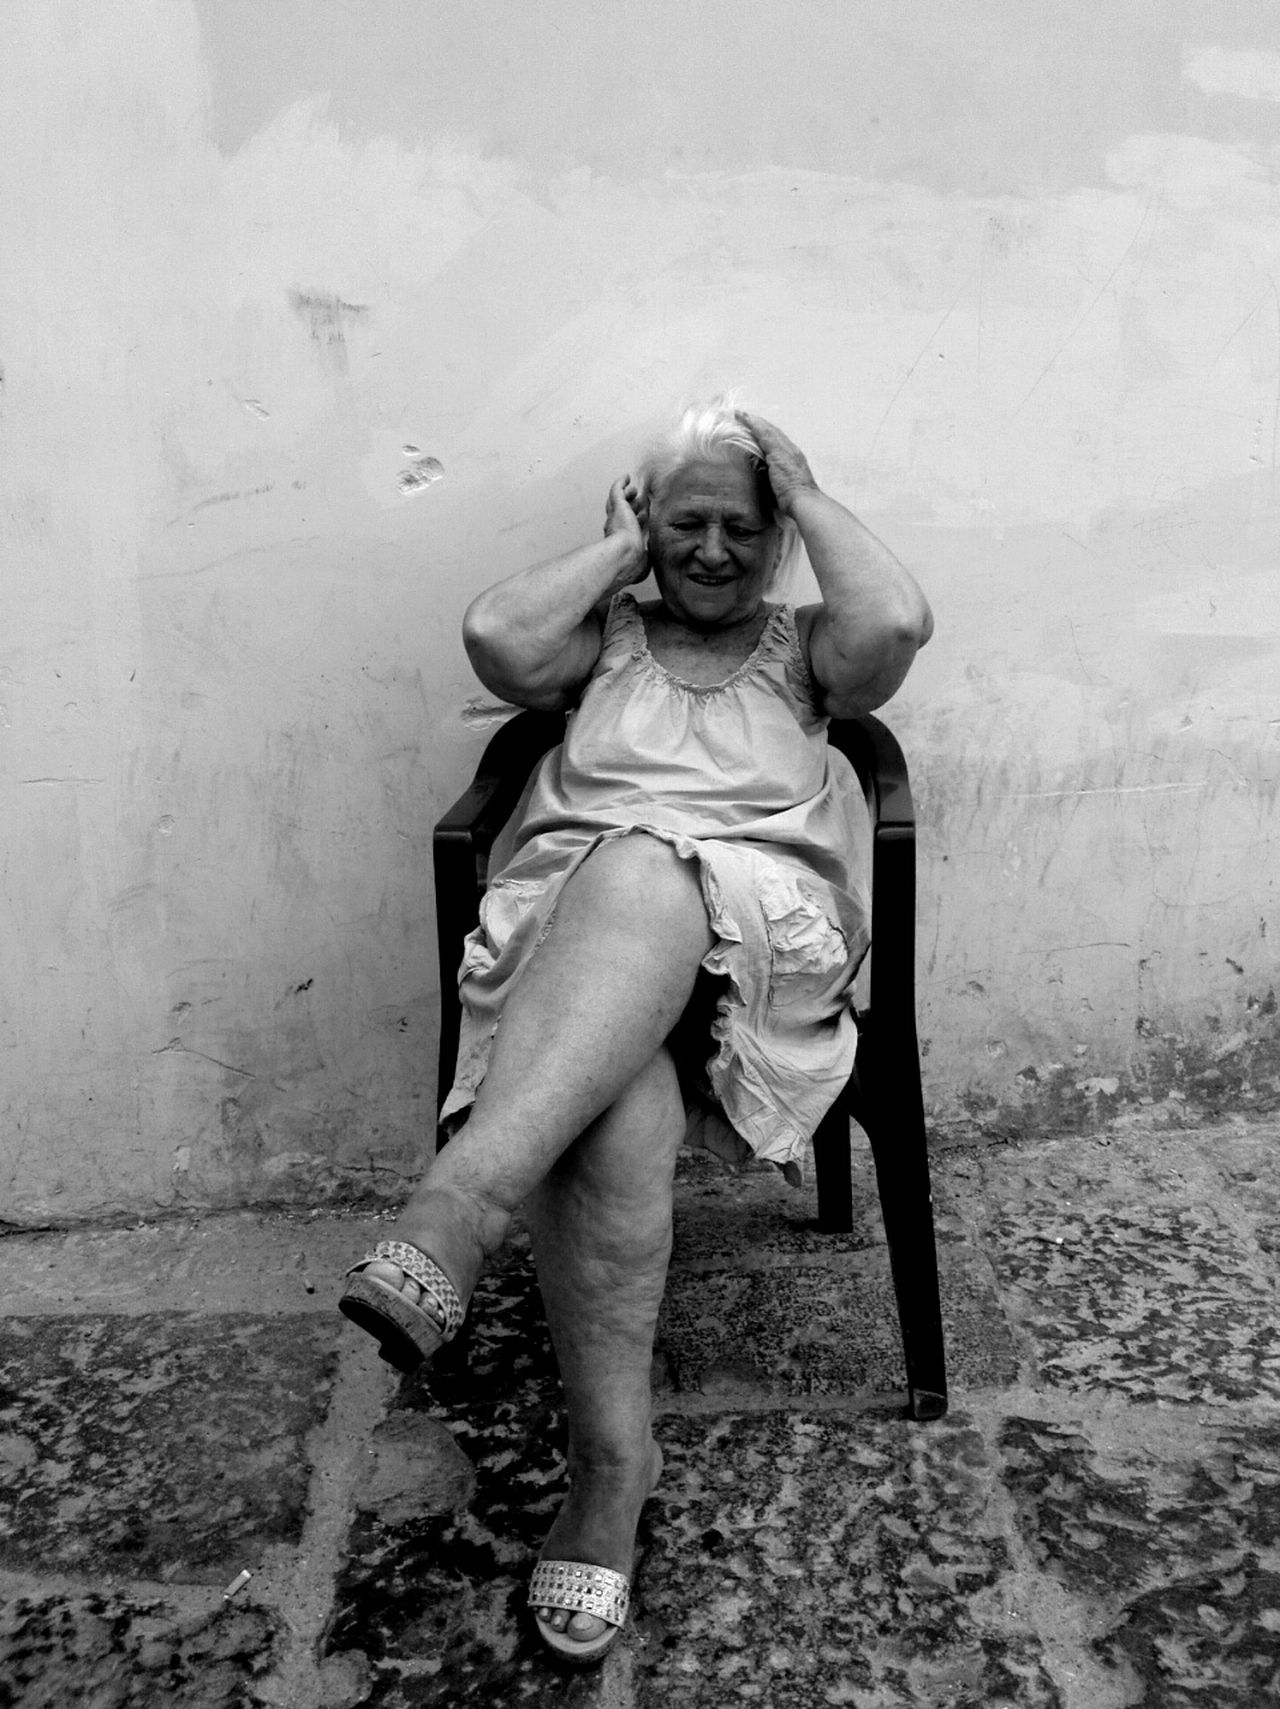 To be beautiful Blackandwhite Photography Black & White Streetphotography Napoli Italy Streetphotography_bw